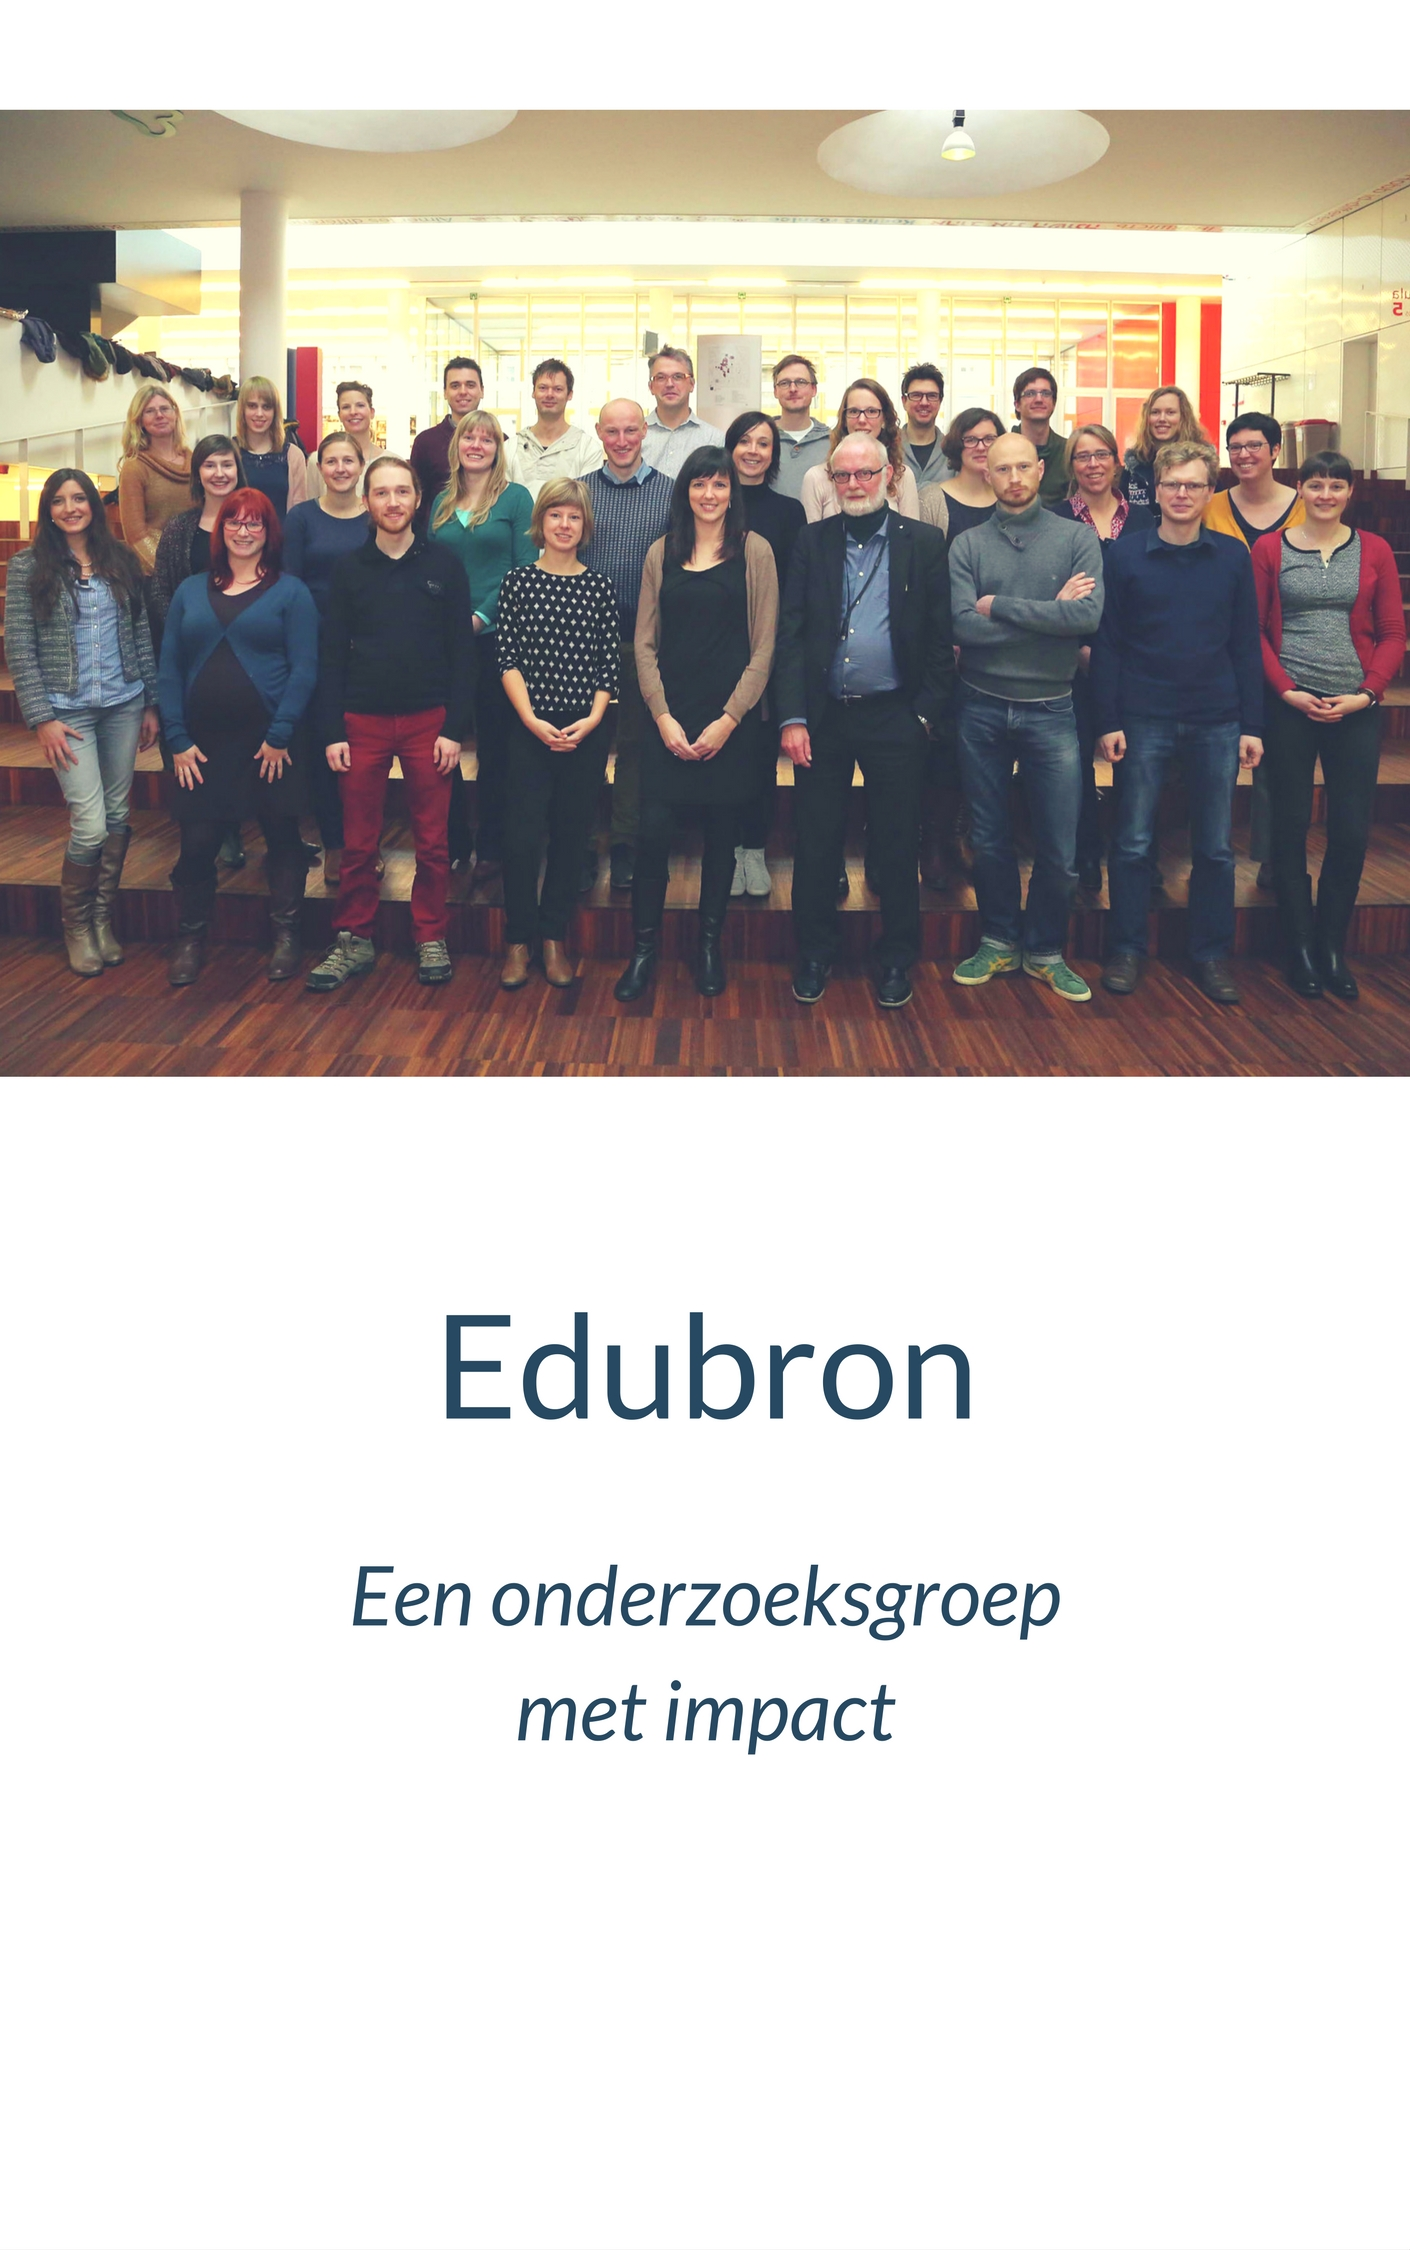 Edubron blogt